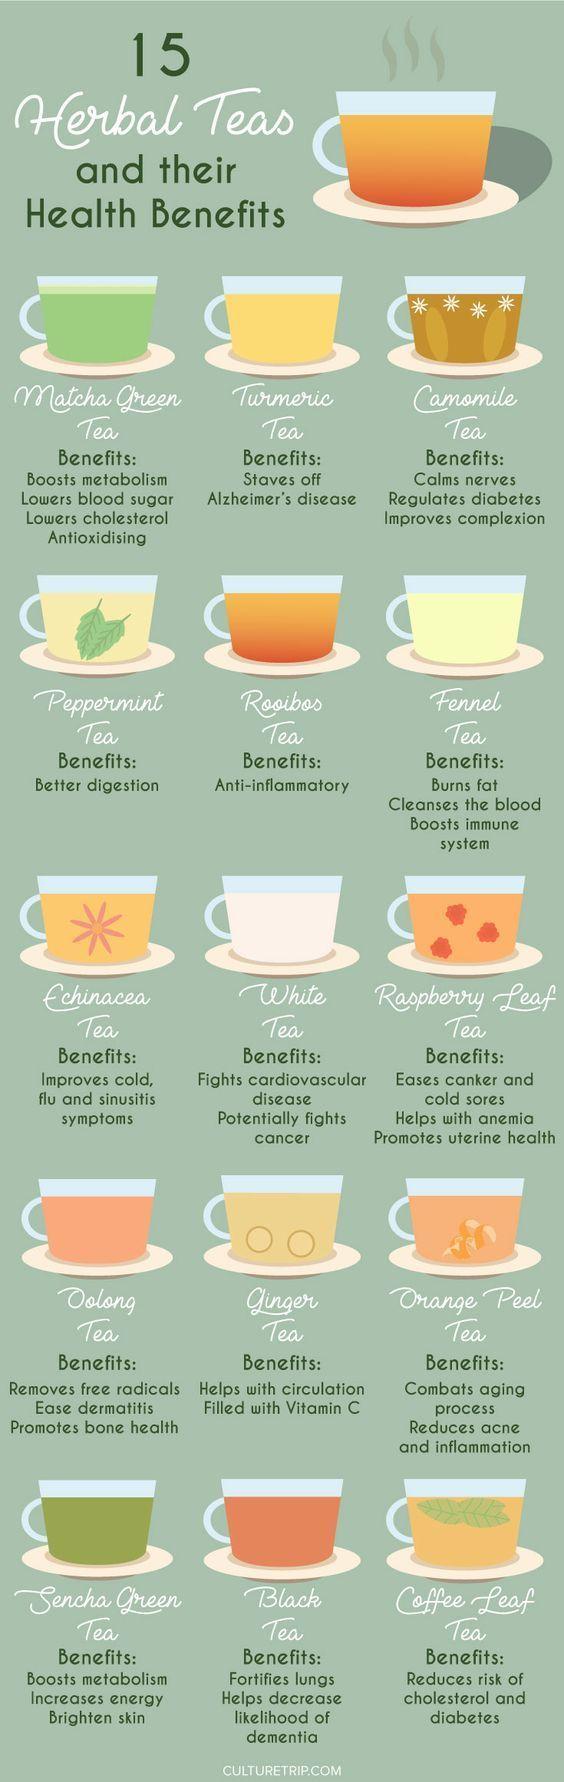 15 Herbal Teas and Their Health Benefits|Pinterest: @theculturetrip